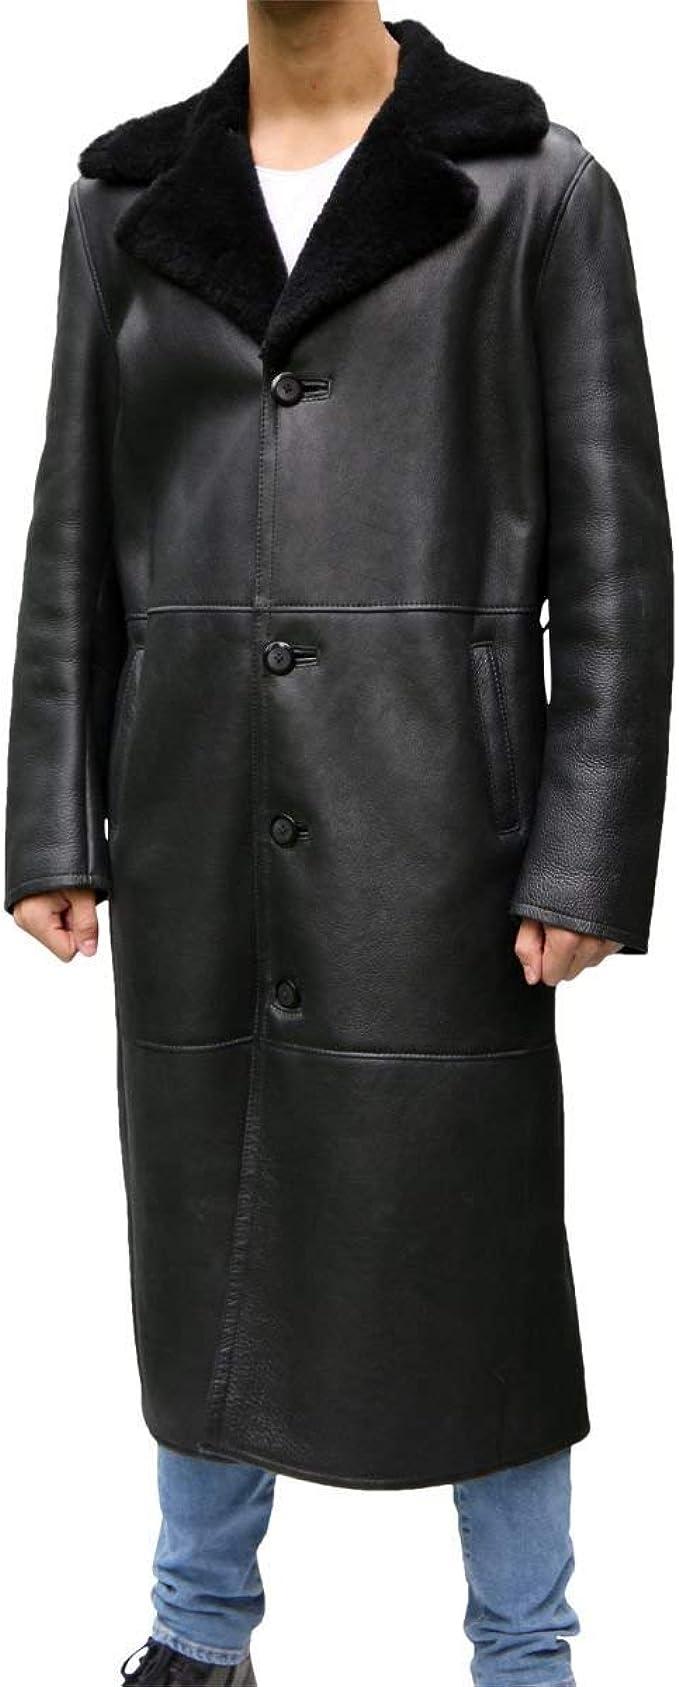 Hollert German Leather Fashion Lammfellmantel ADAM Herren